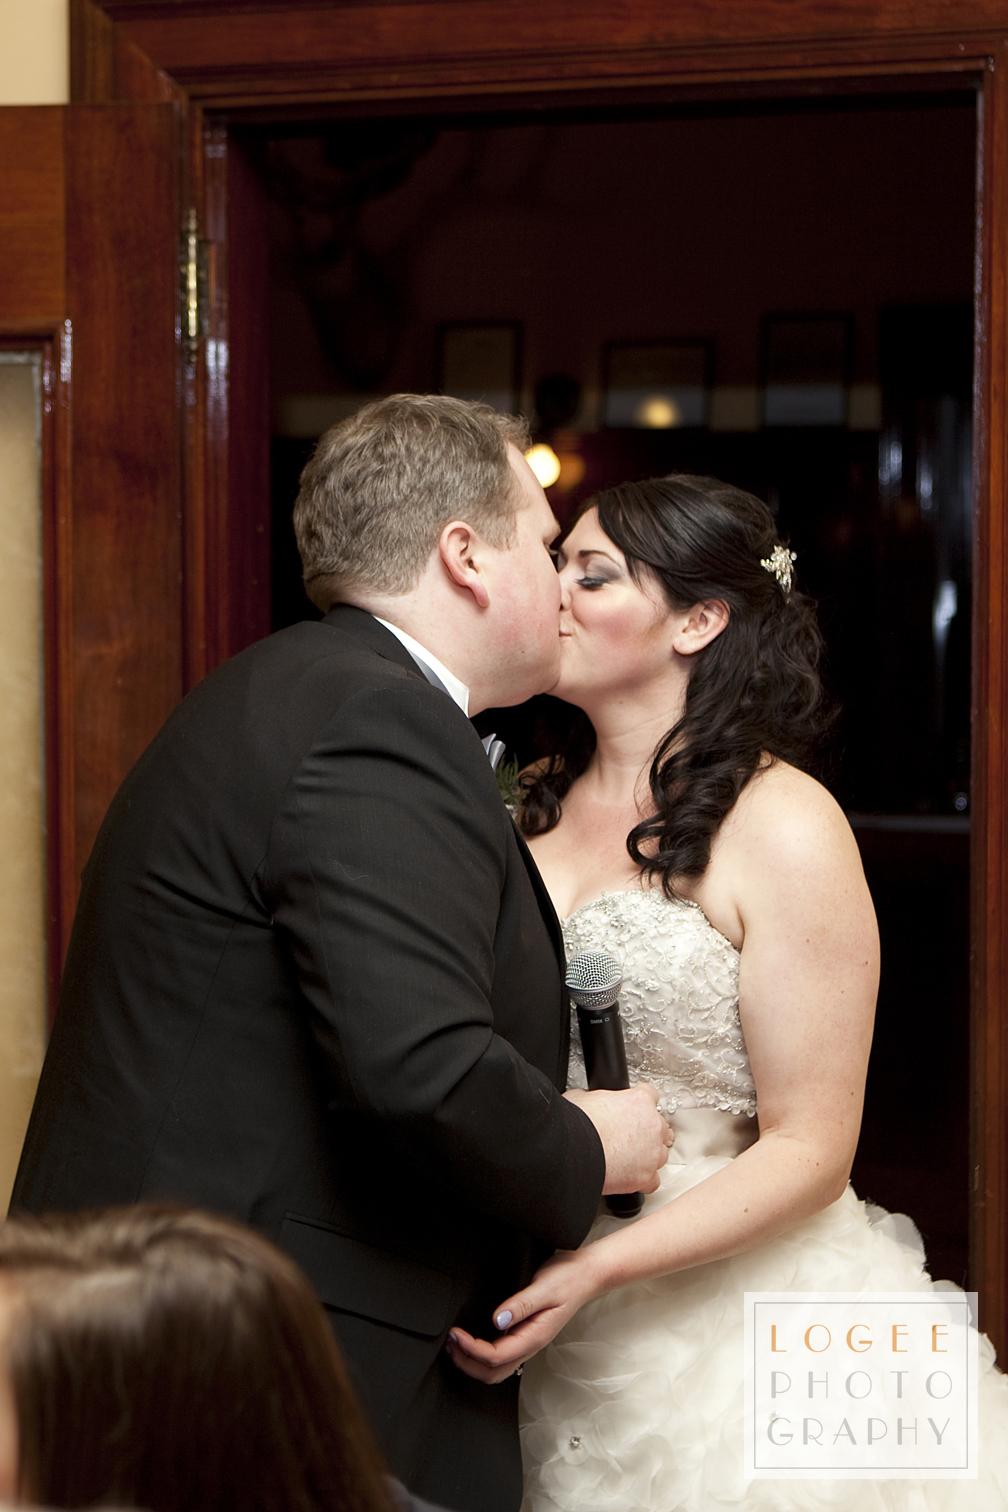 McIntosh-Burns Wedding - 7122Aw